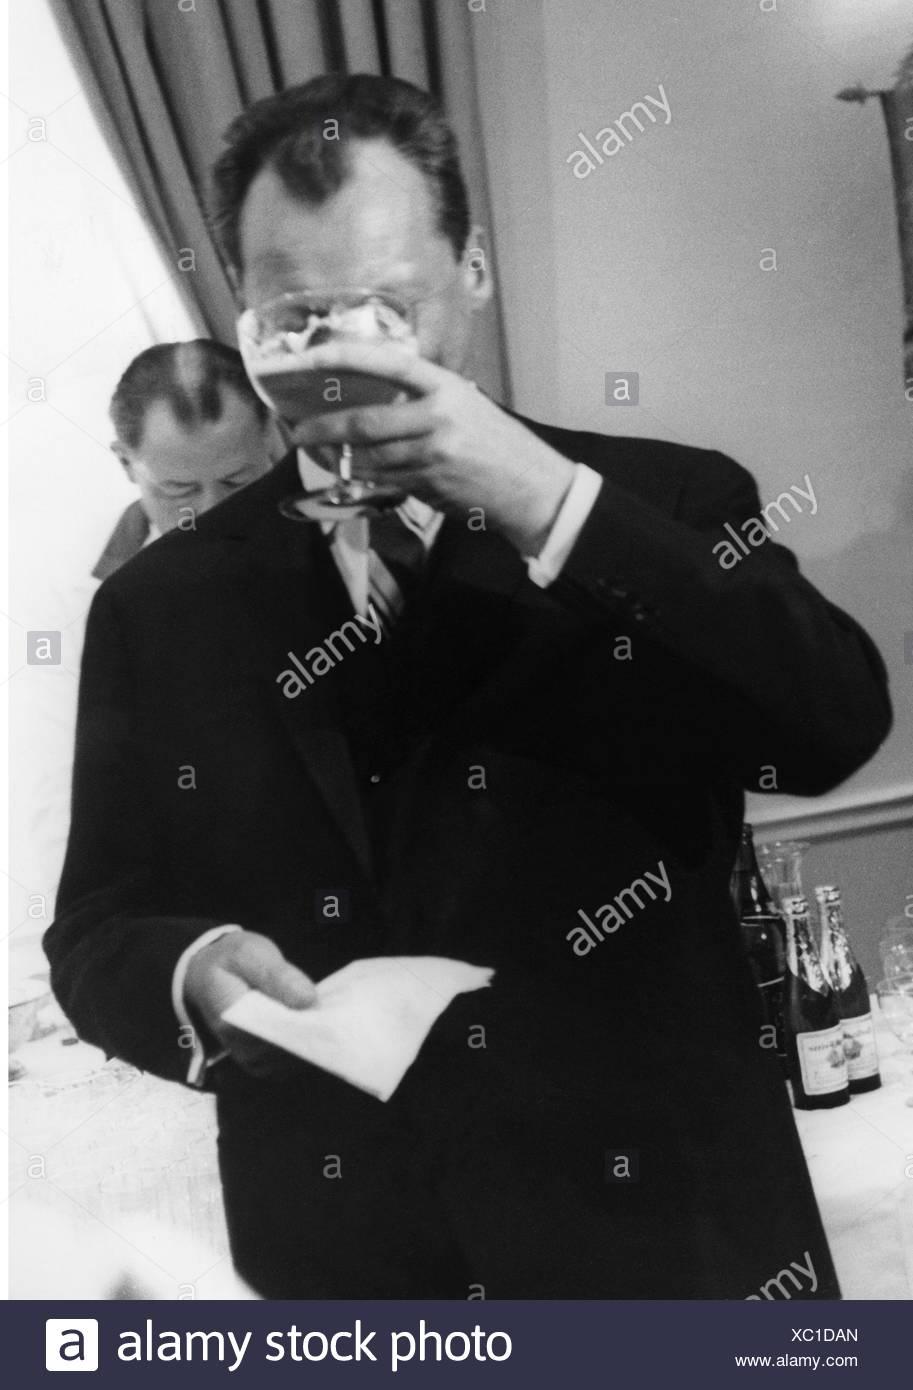 Brandt, Willy, 18.12.1913 - 8. 10.1992, German politician (SPD), Governing Mayor of Berlin 3.10.1957 - 1.12.1966, visit to New Stockbild